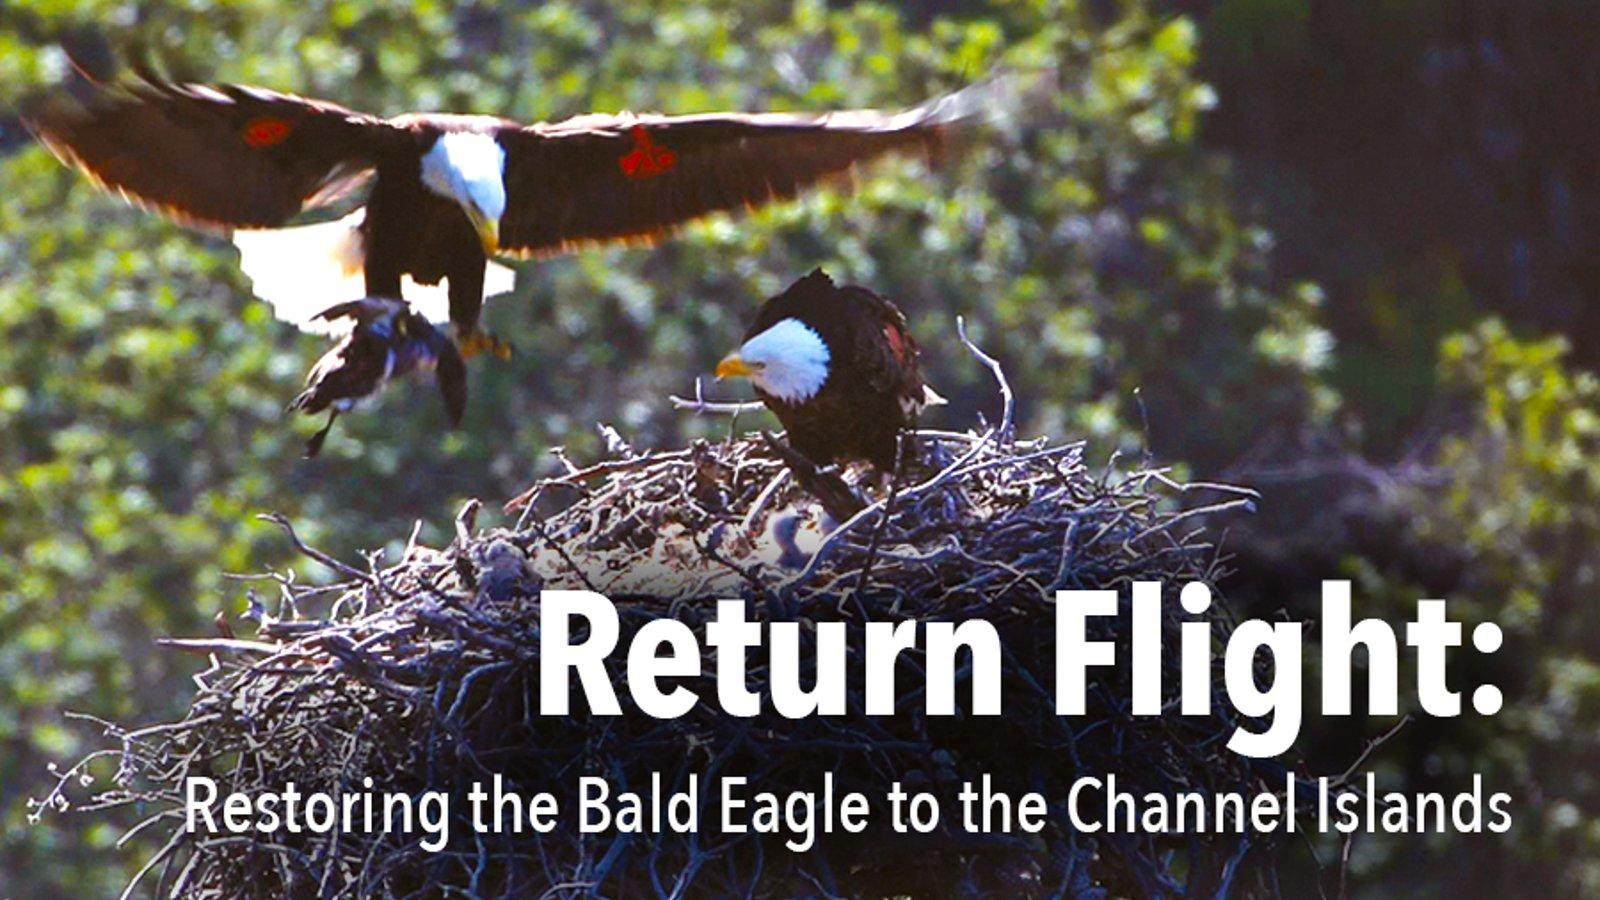 Return Flight: Restoring the Bald Eagle to the Channel Islands